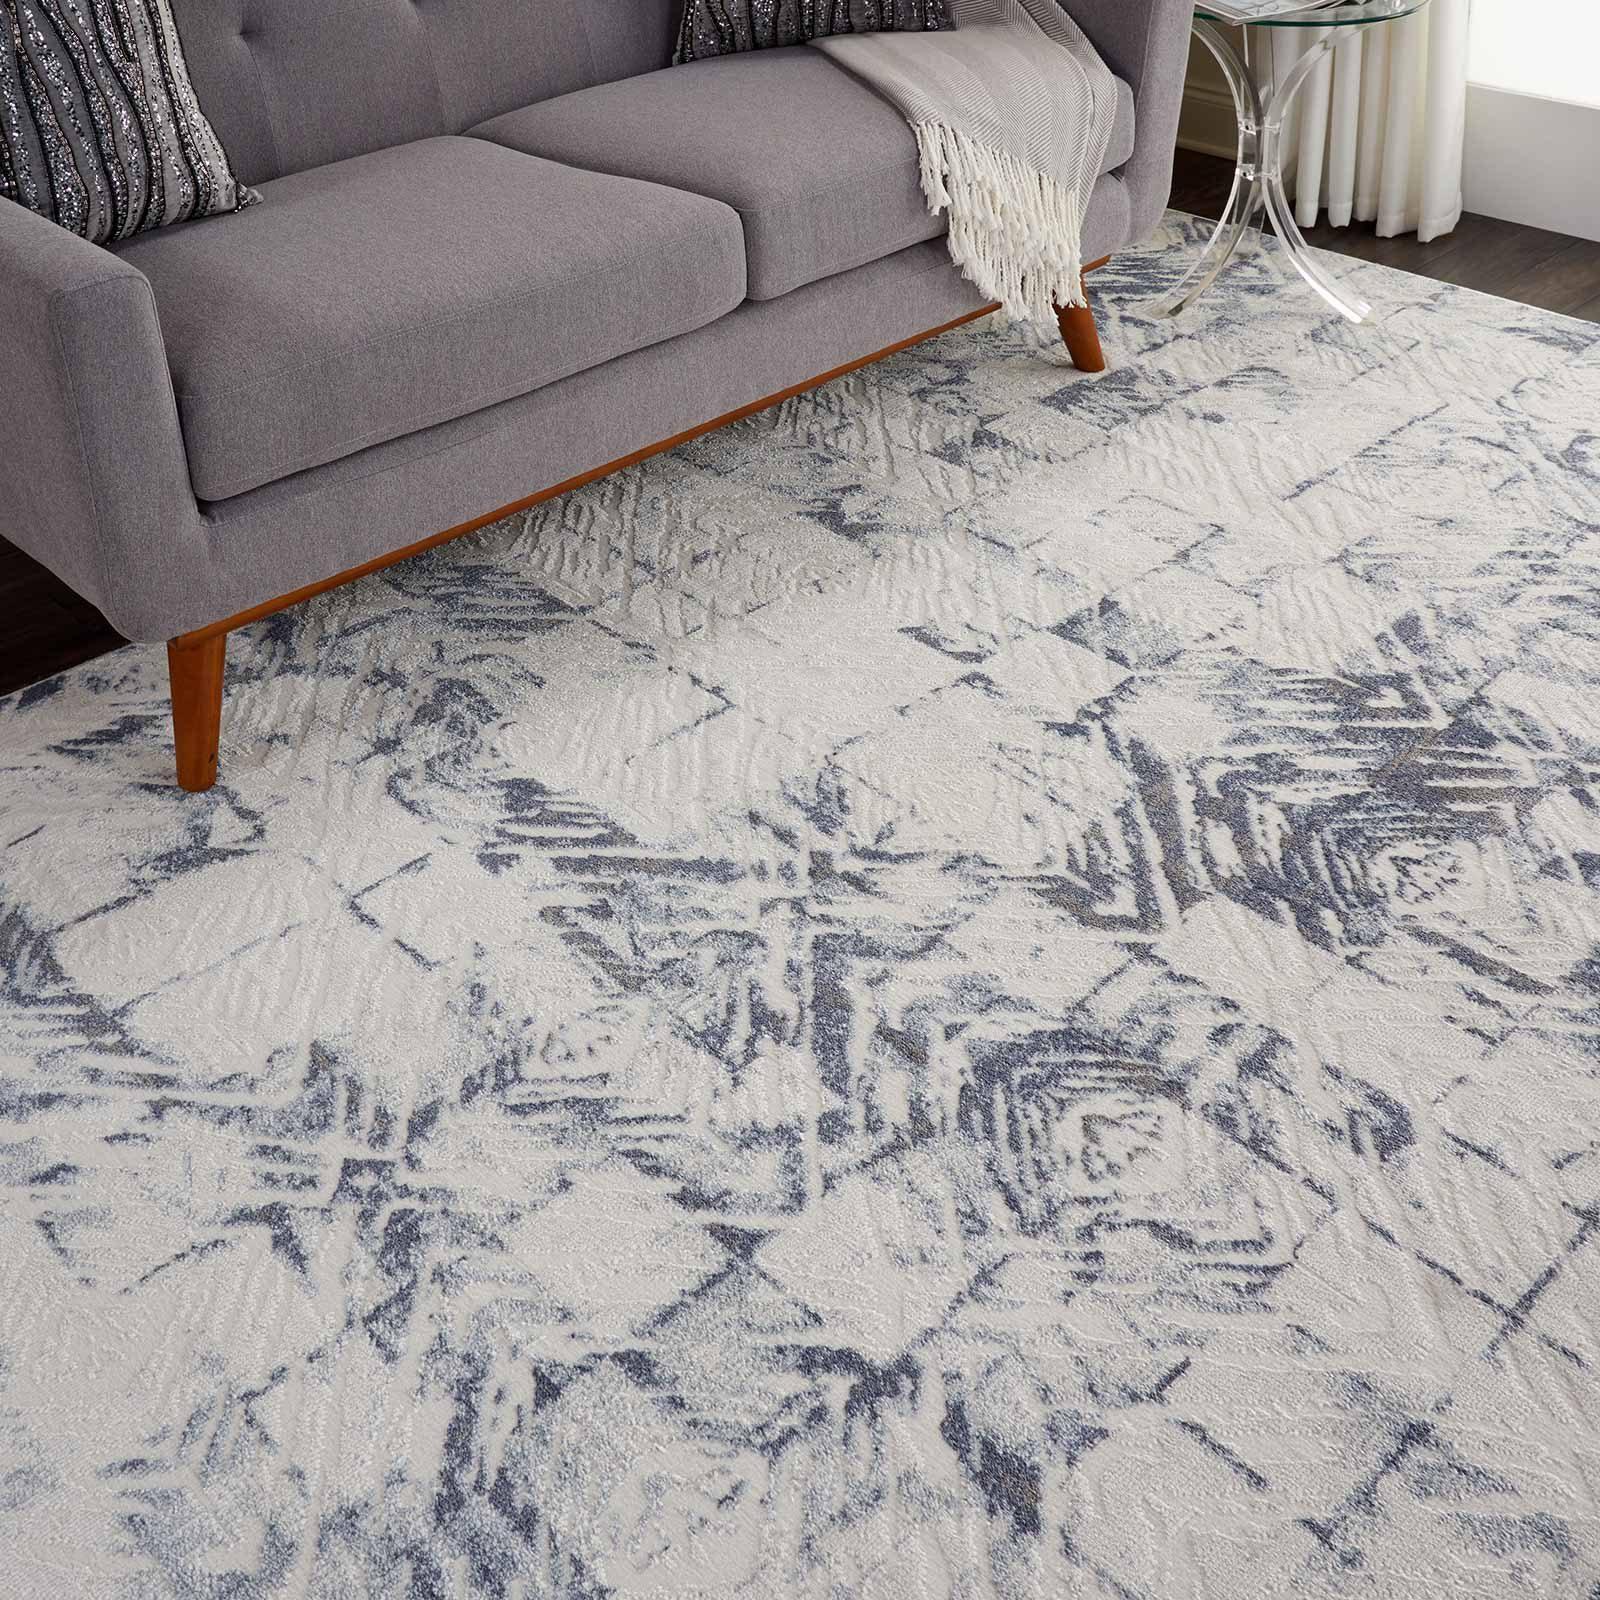 Nourison rug Urban Decor URD02 IVORY BLUE 8X10 099446466983 interior 2 C